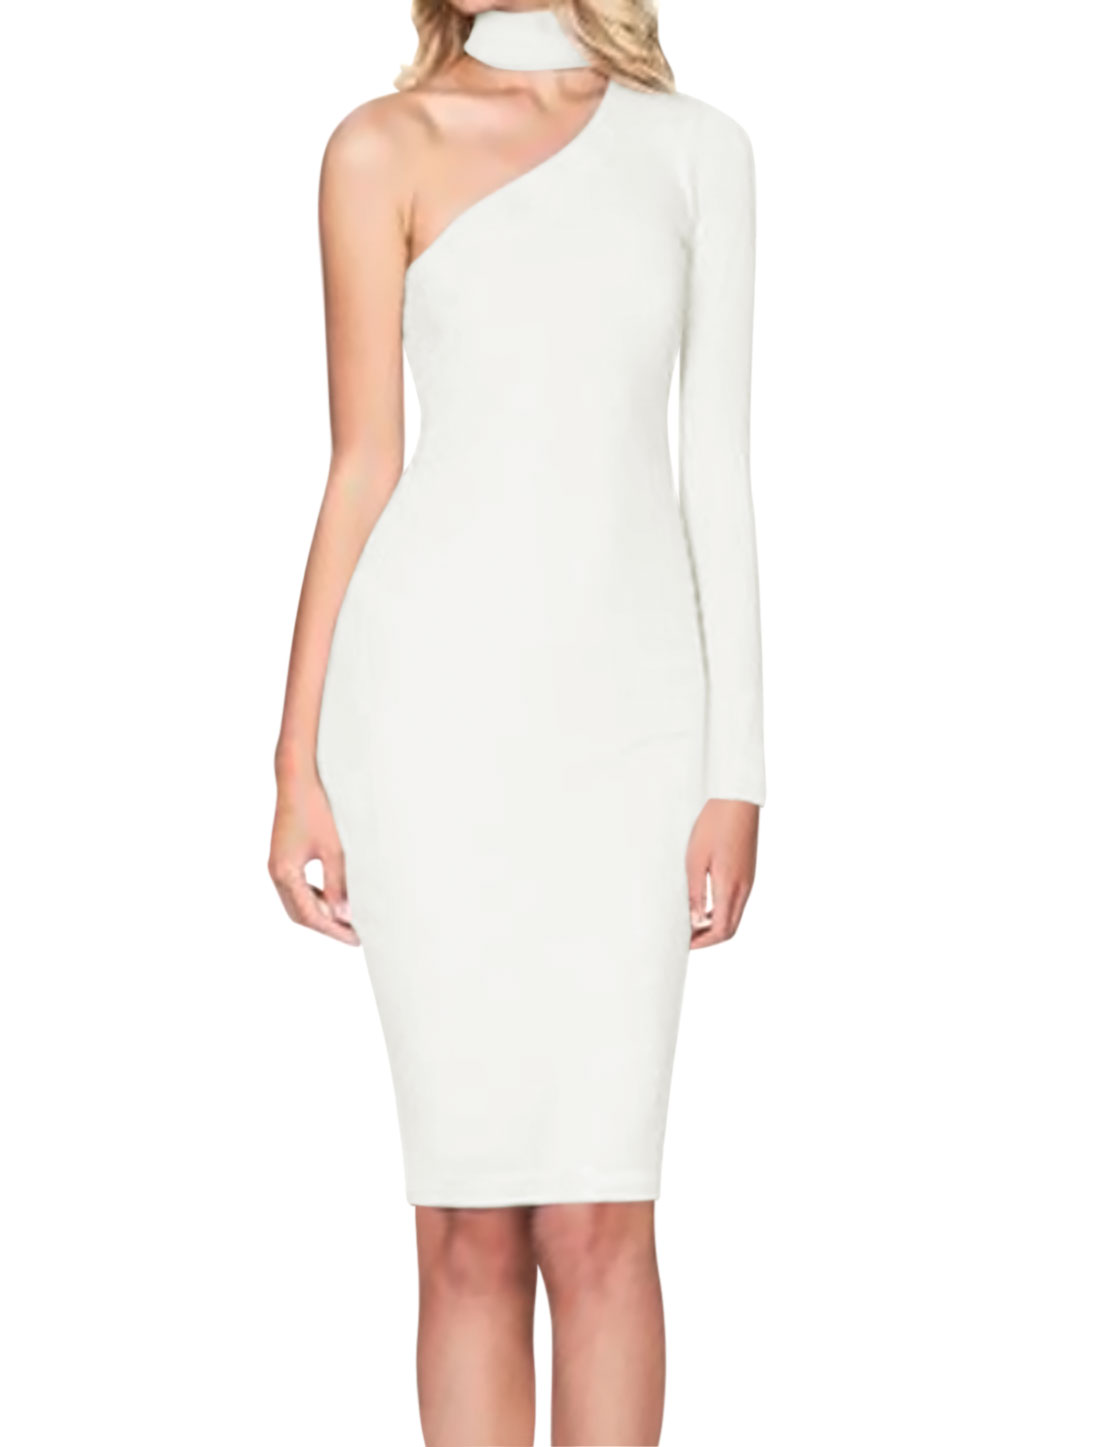 Women Choker Neck One Shoulder Long Sleeves Sheath Dress White M